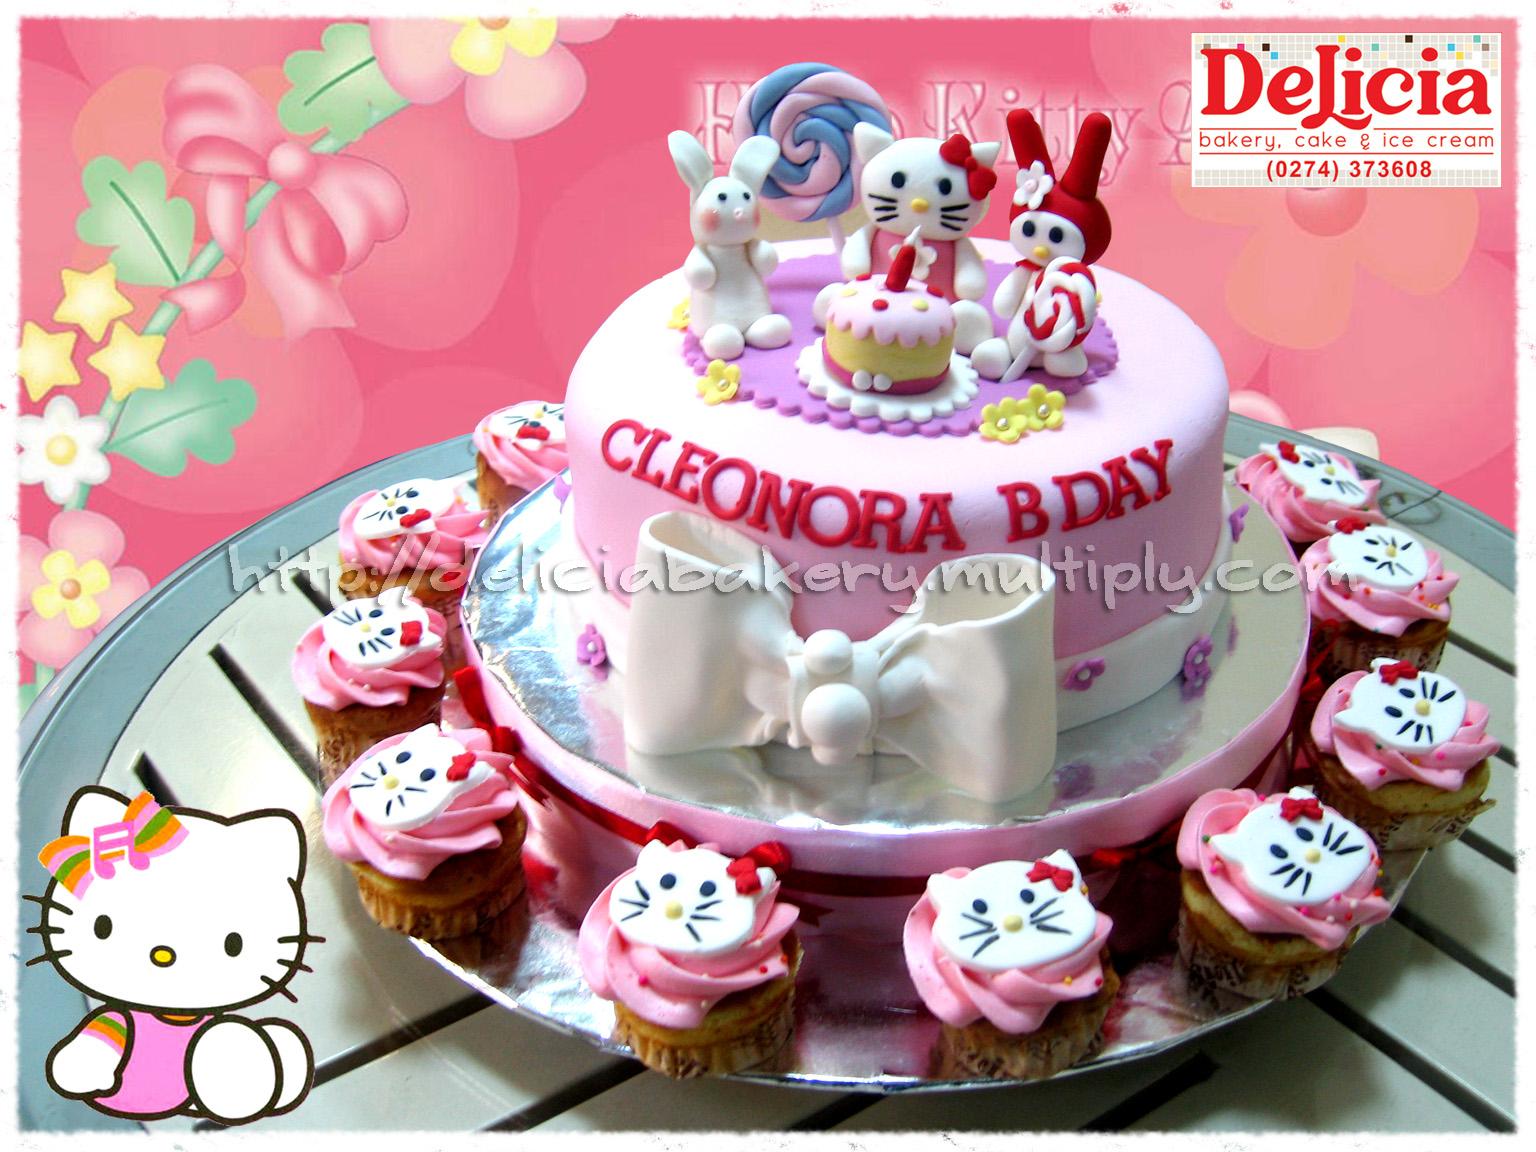 Delicia Bakery Ice Cream Yogyakarta Childern Set Cake N Cupcake